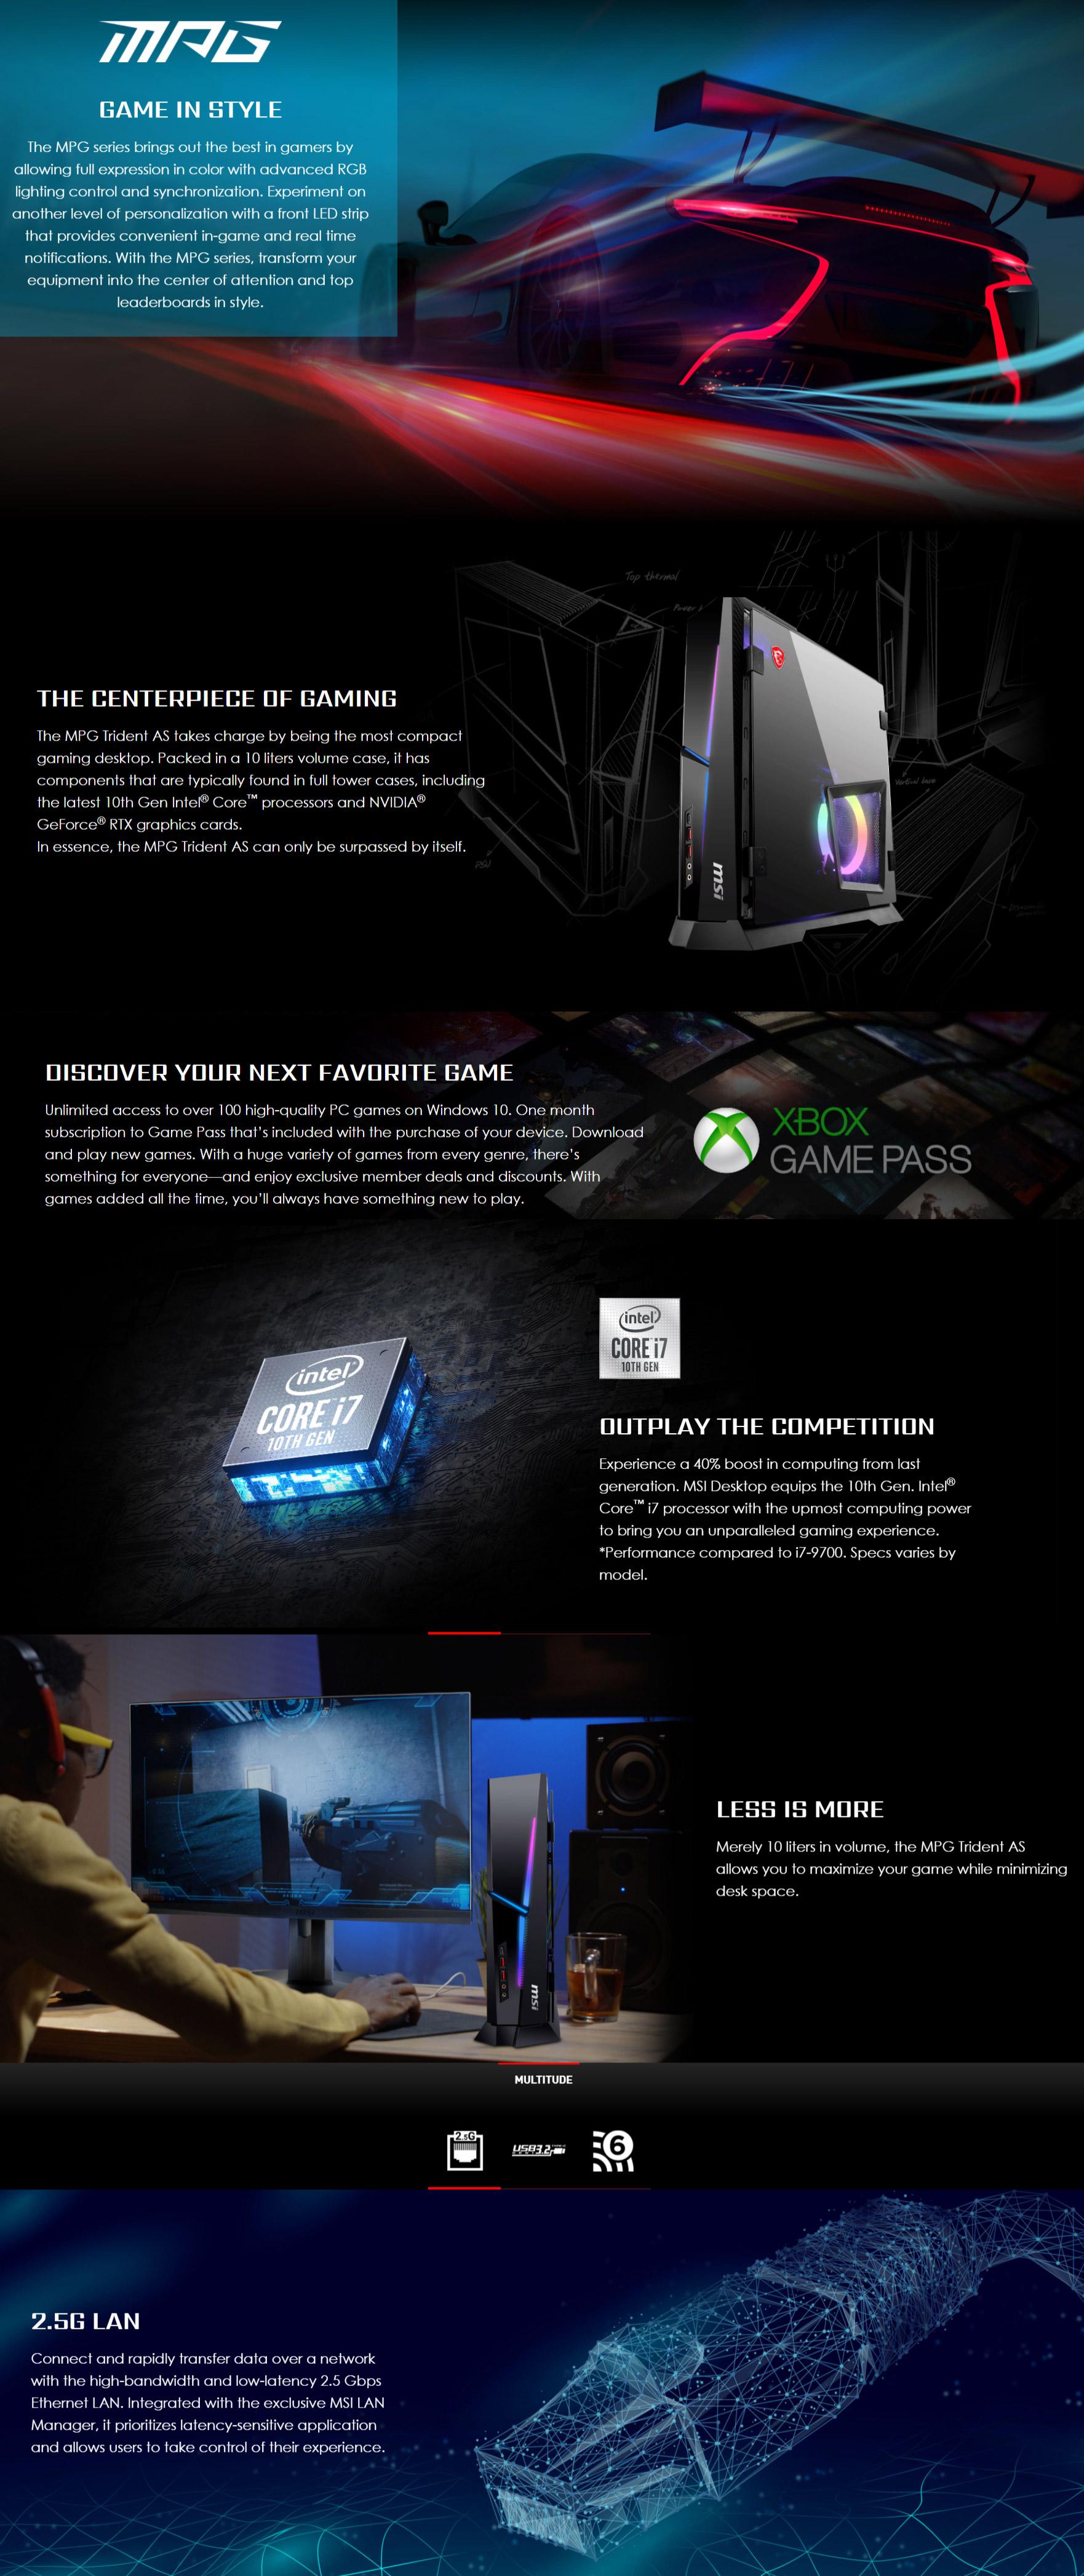 screencapture-msi-Desktop-MPG-Trident-AS-10th-Overview-2020-11-19-13_24_34.jpg